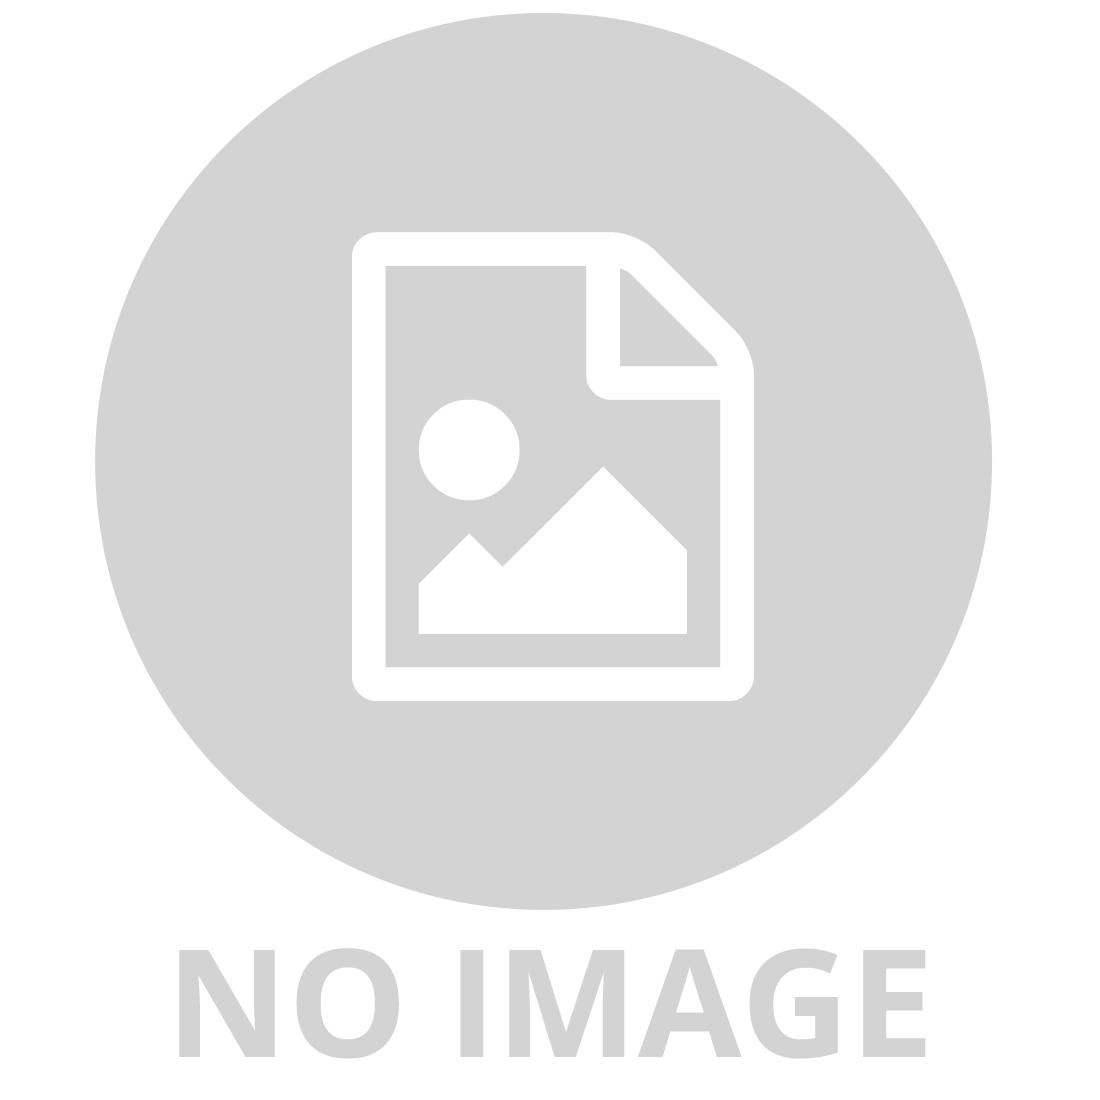 TONKA STEEL TOUGHEST MIGHT DUMP TRUCK